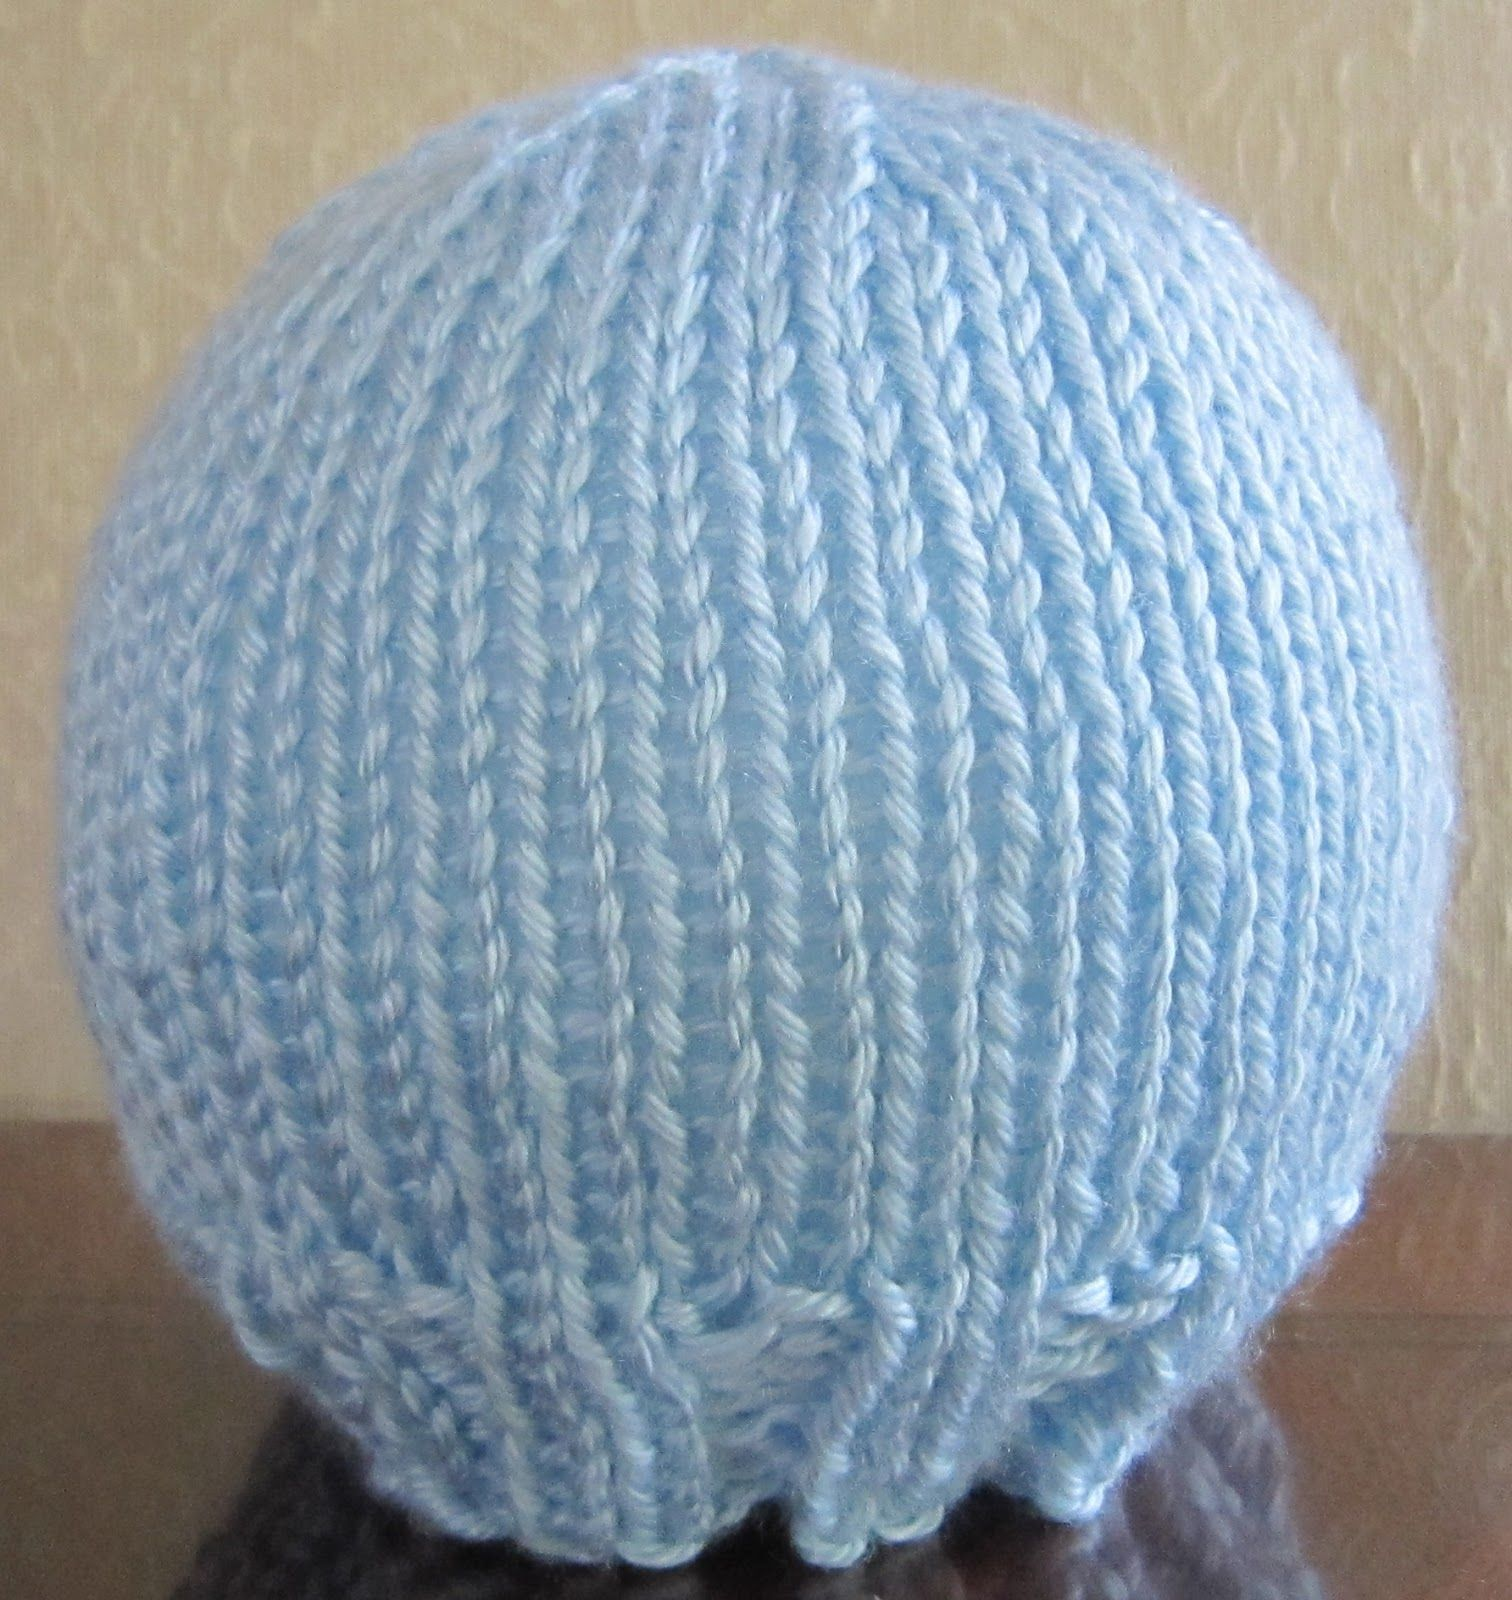 Sea trail grandmas fast and easy newborn hat knit pattern sea trail grandmas fast and easy newborn hat knit pattern bankloansurffo Gallery